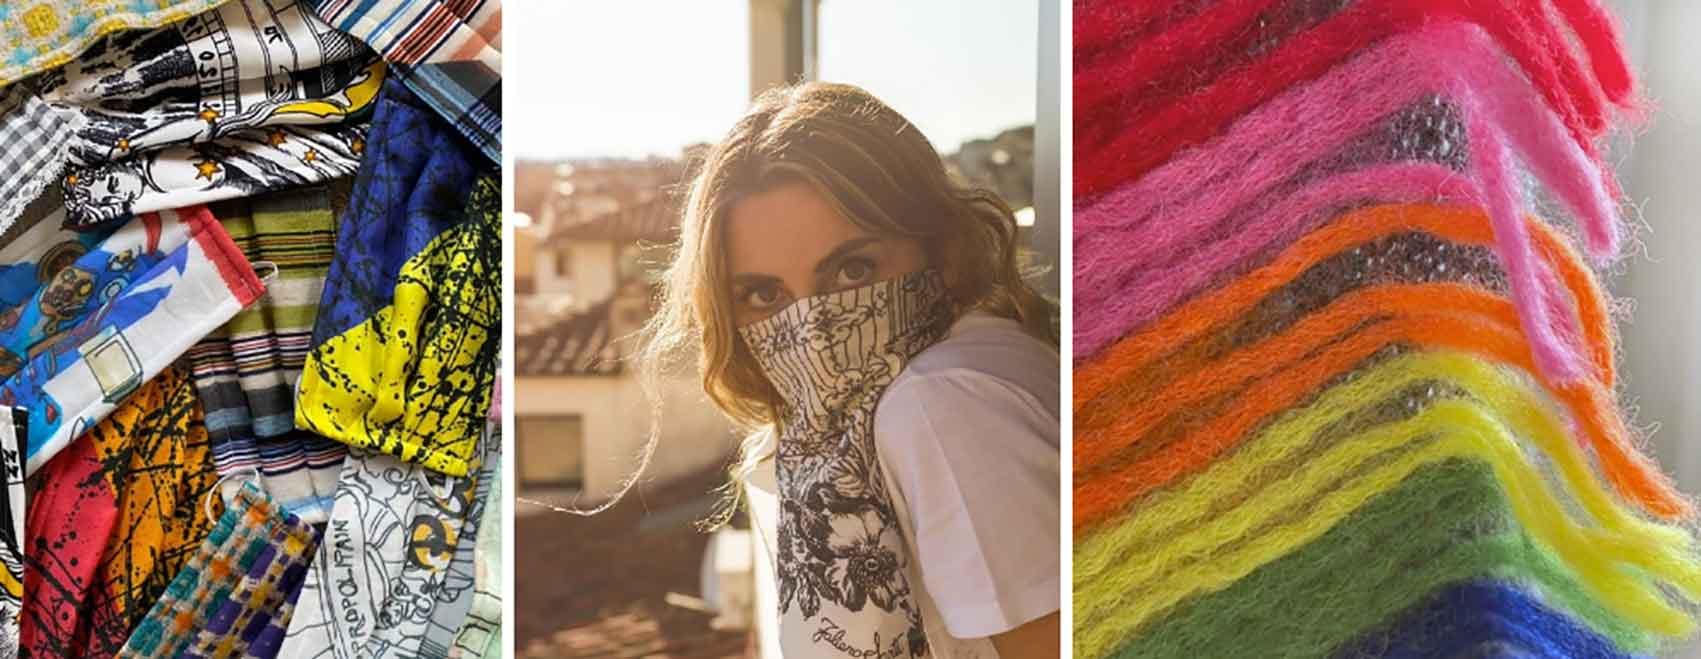 FALIERO-SARTI-מגזין-אופנה